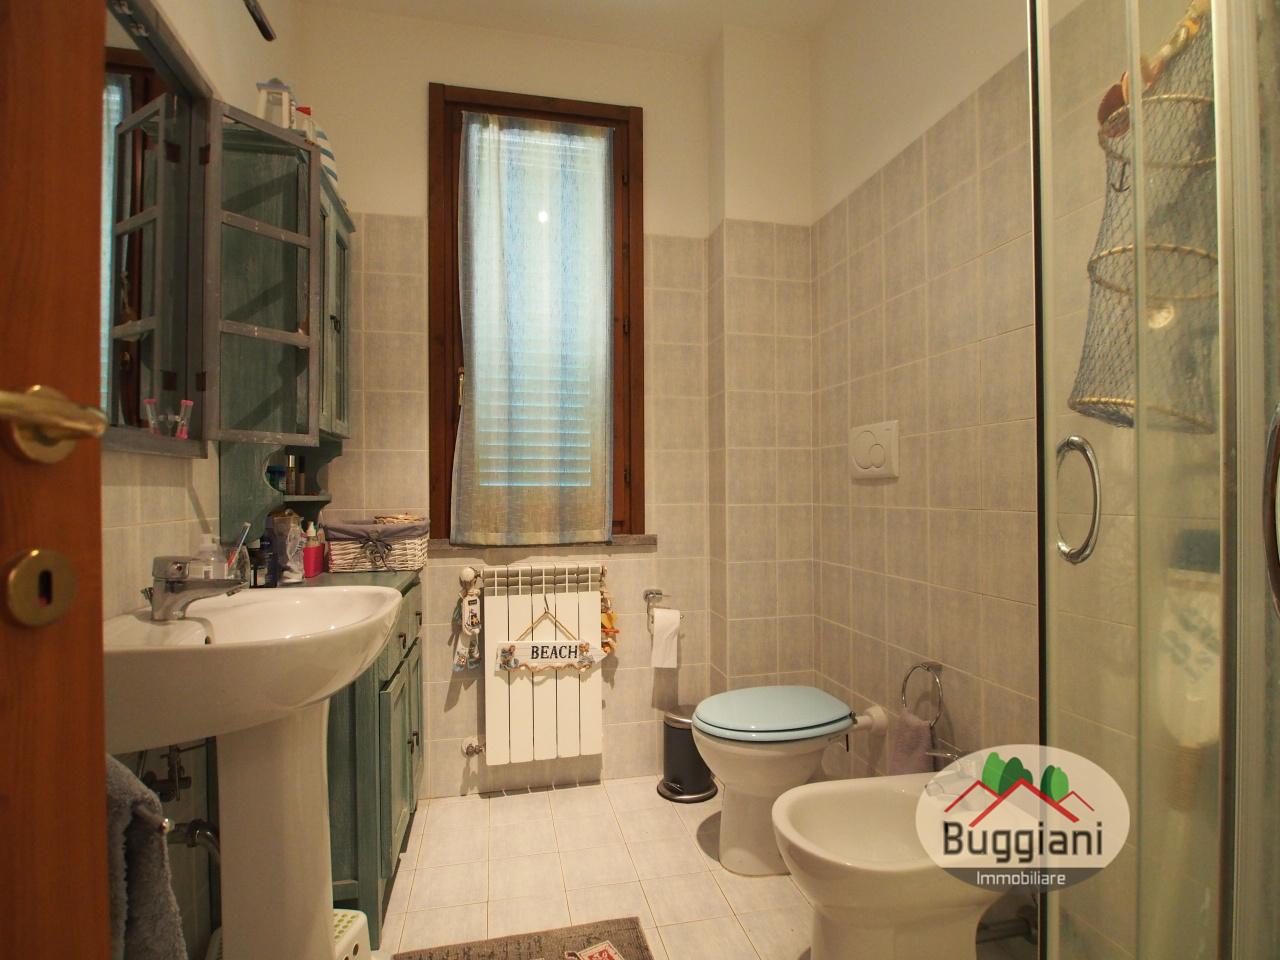 Appartamento in vendita RIF. 1902, Montopoli in Val d'Arno (PI)